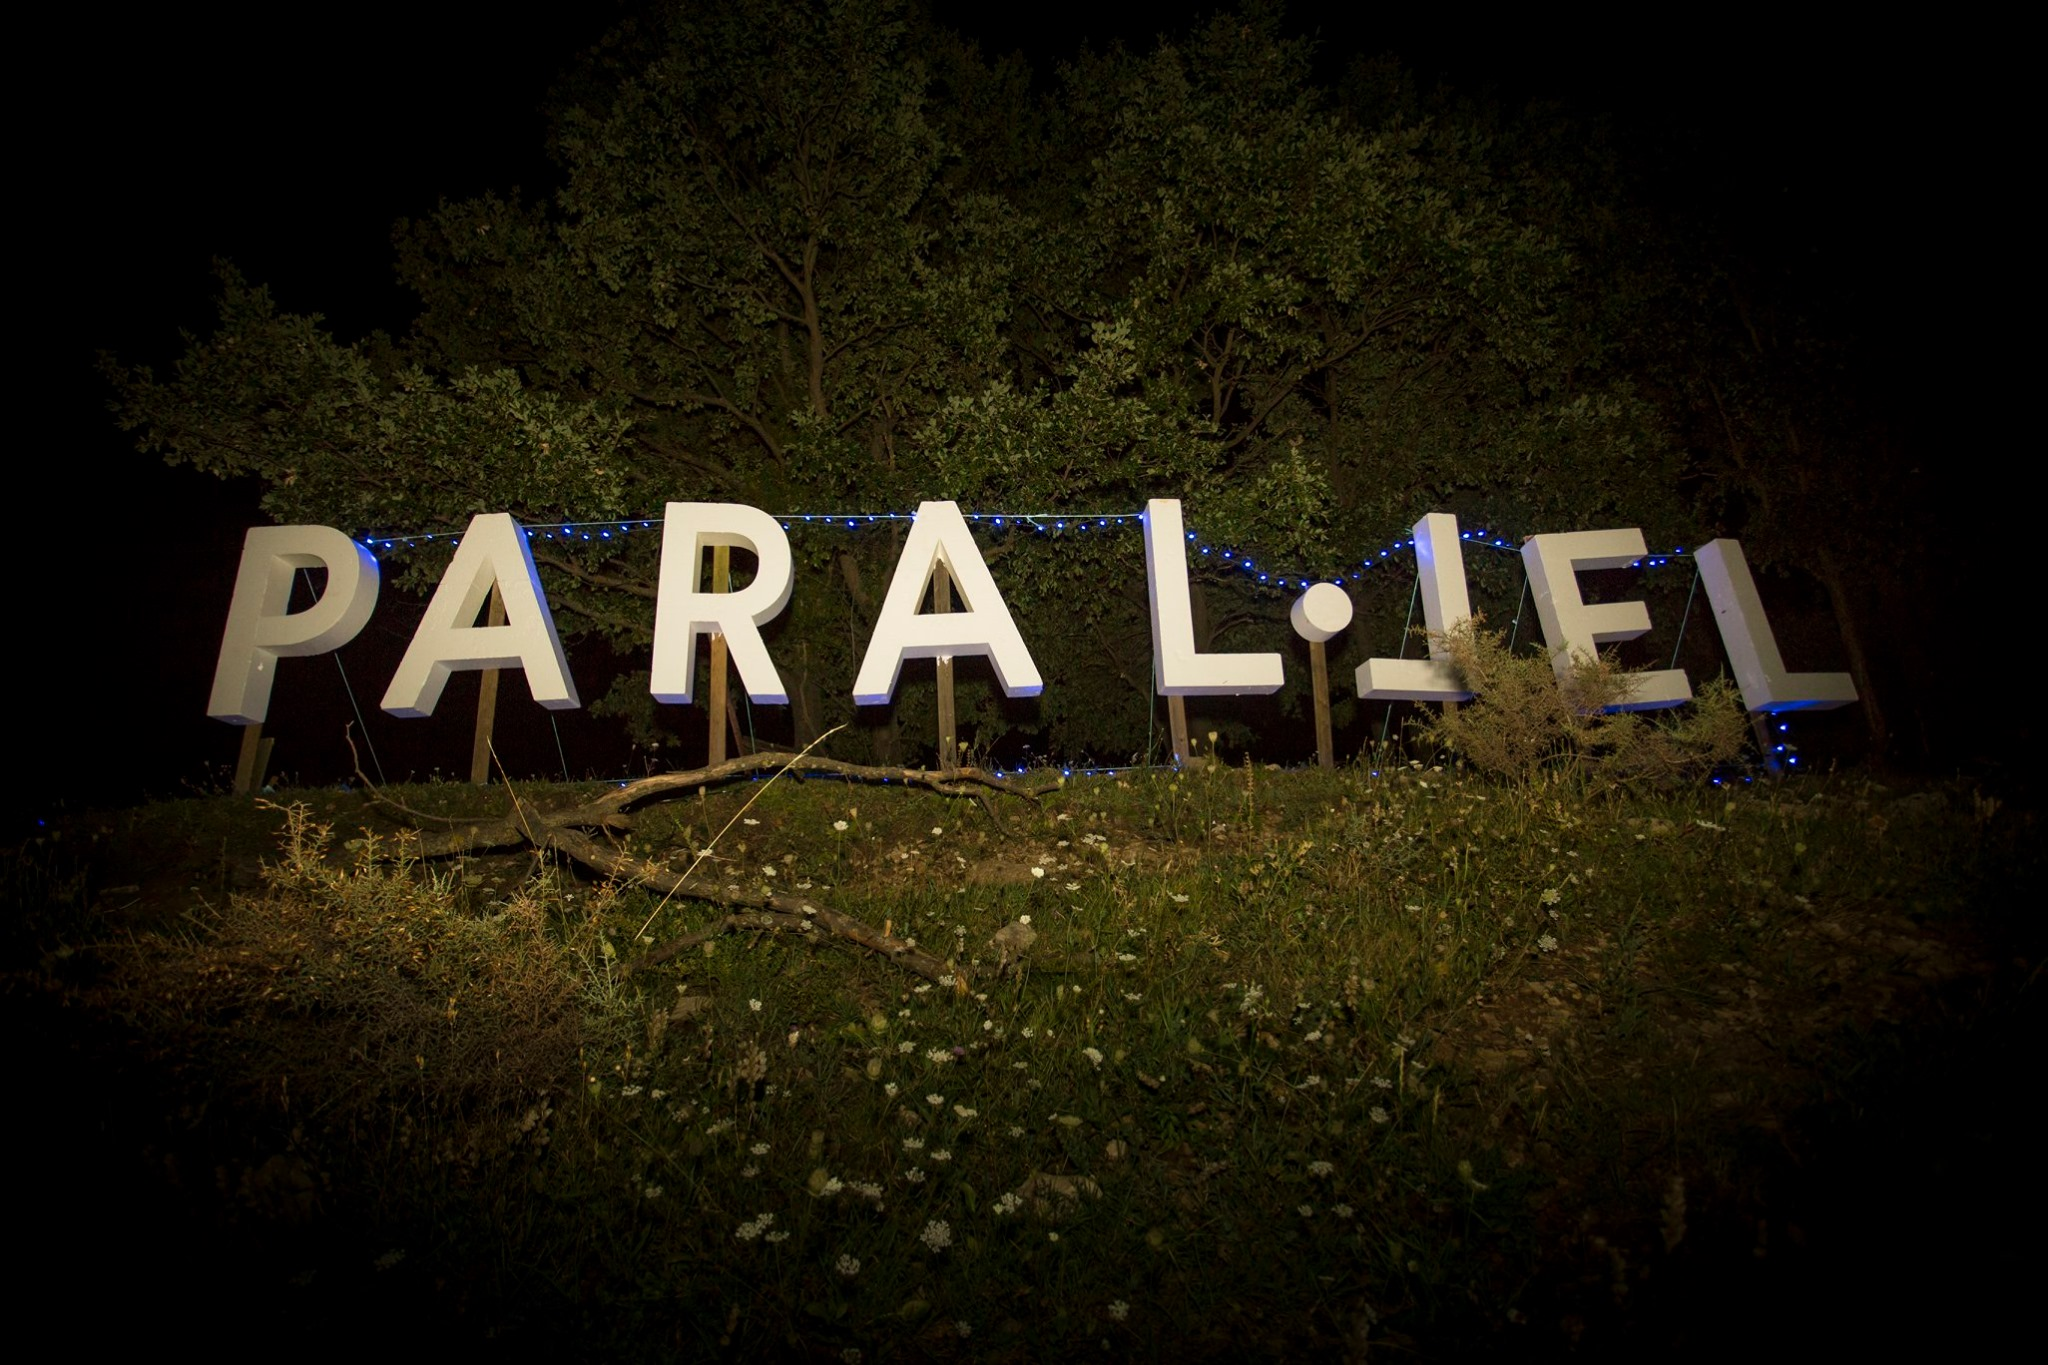 El Techno Hollywood cartel de Paral·lel Festival. Pic by Dídac Ramírez.